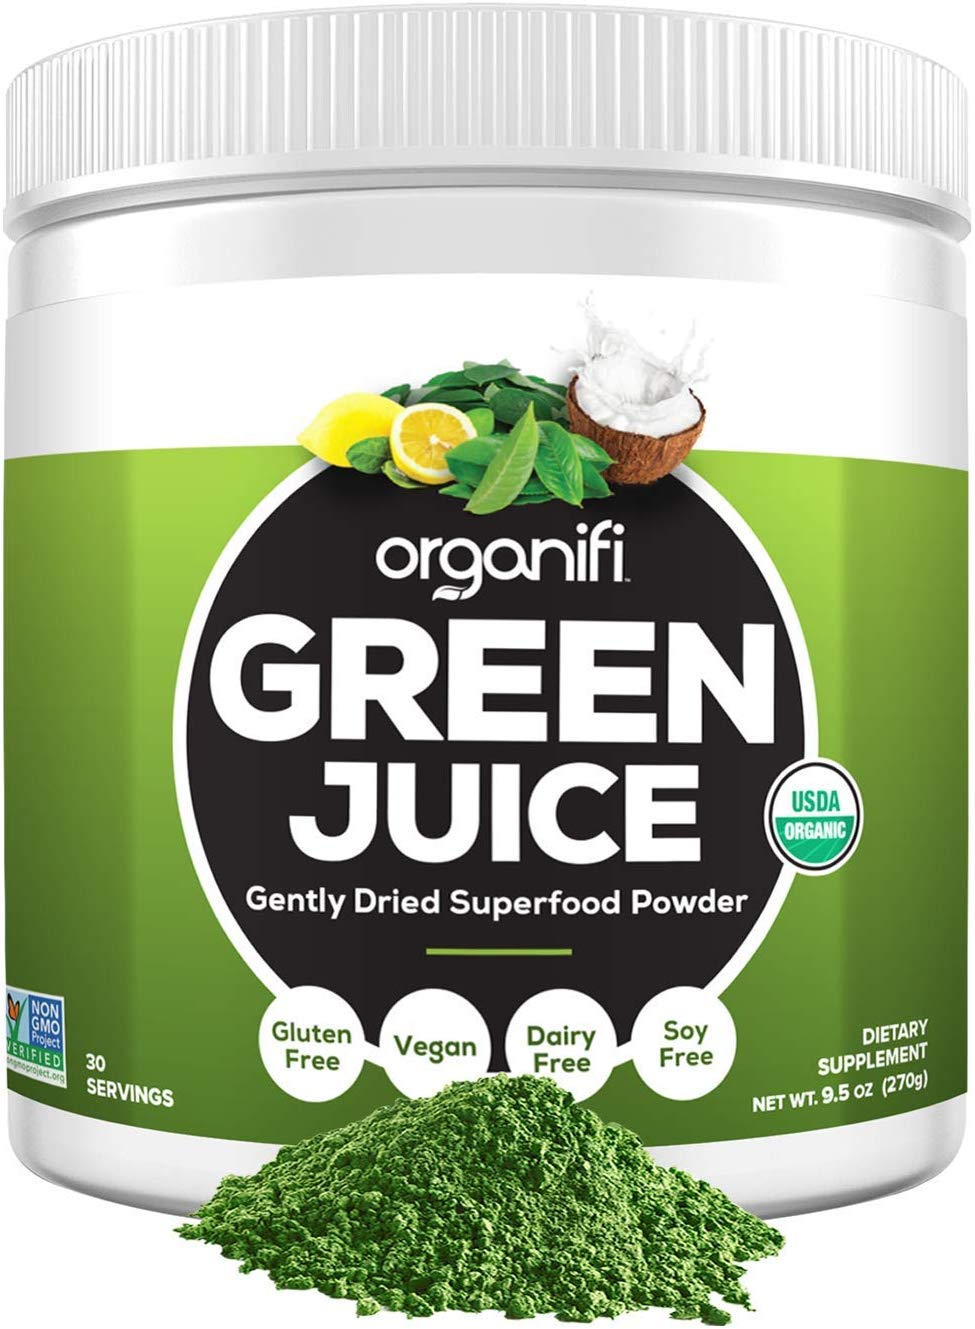 Organifi Green Juice Powder